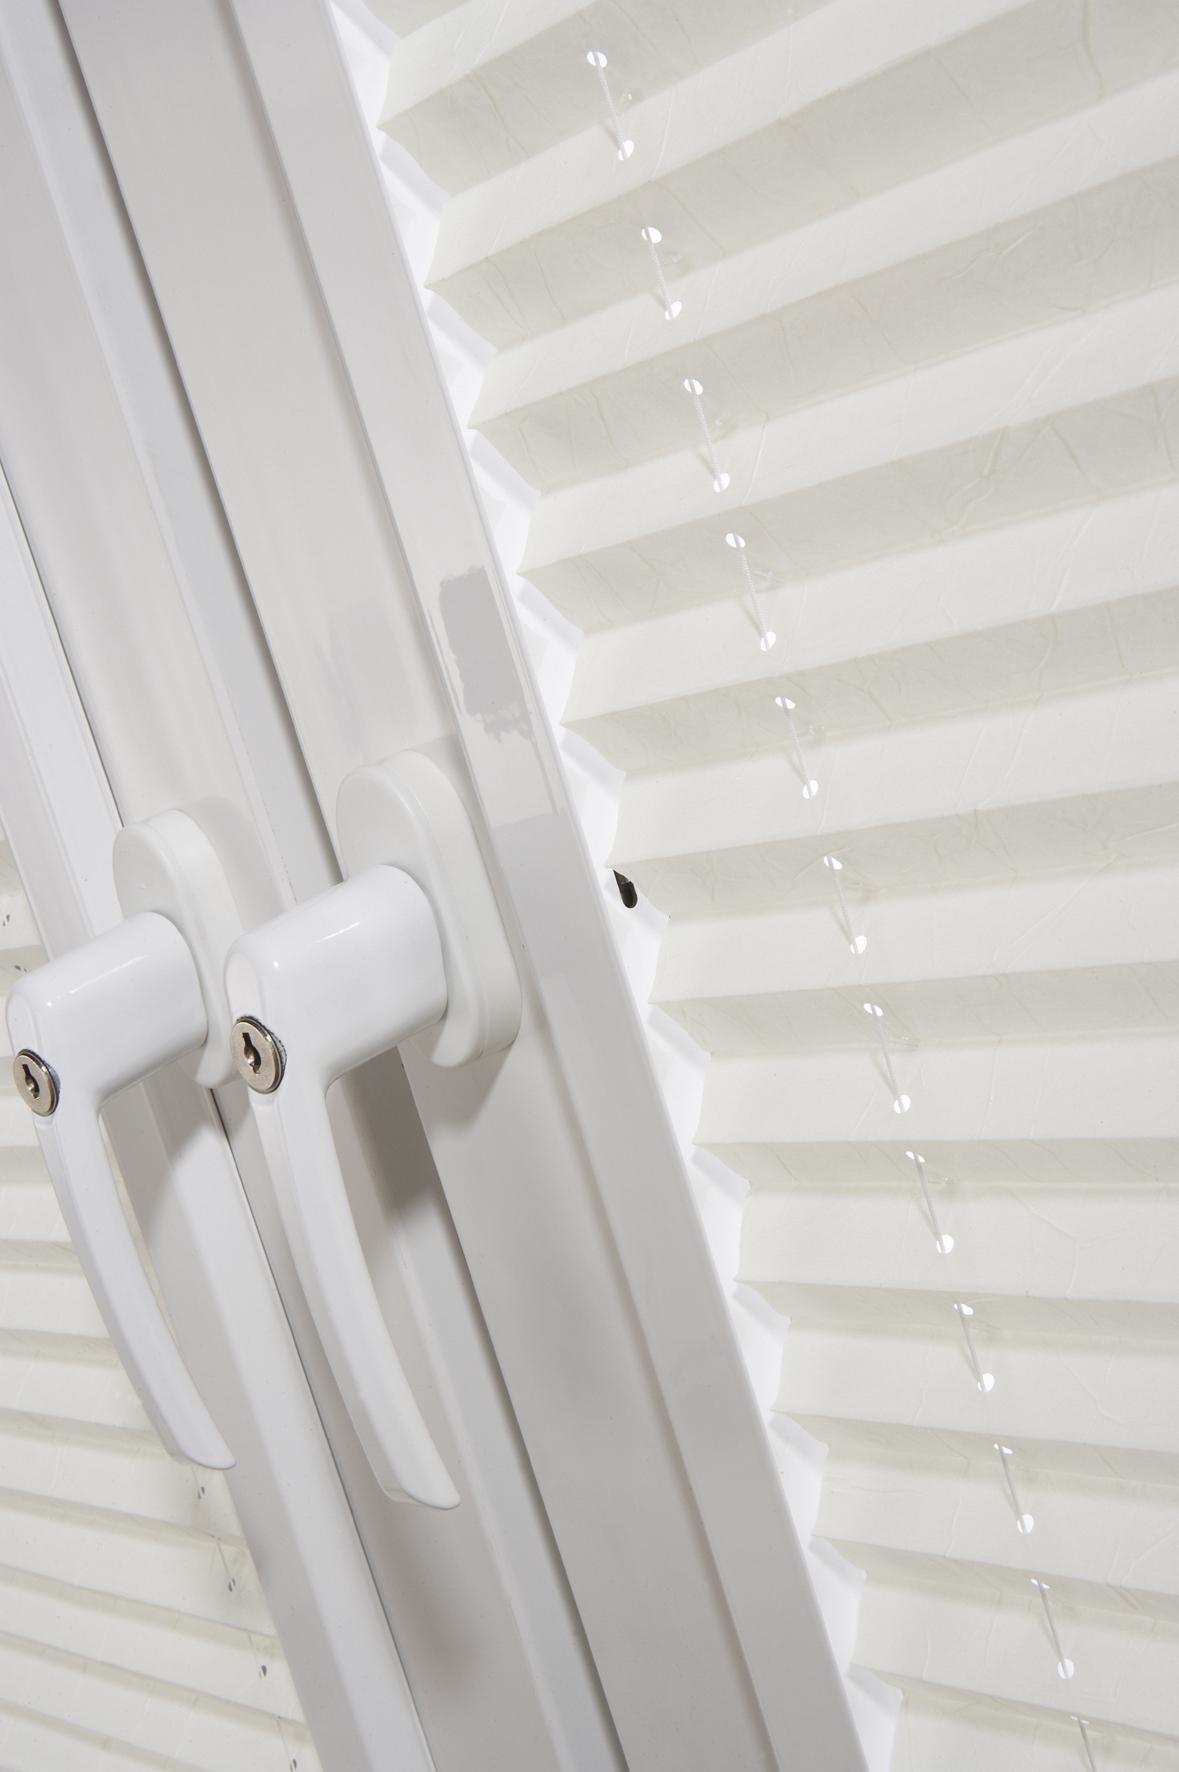 drape sheer wavefold blinds dollarcurtainsandblinds louver curtains pin drapes dollar